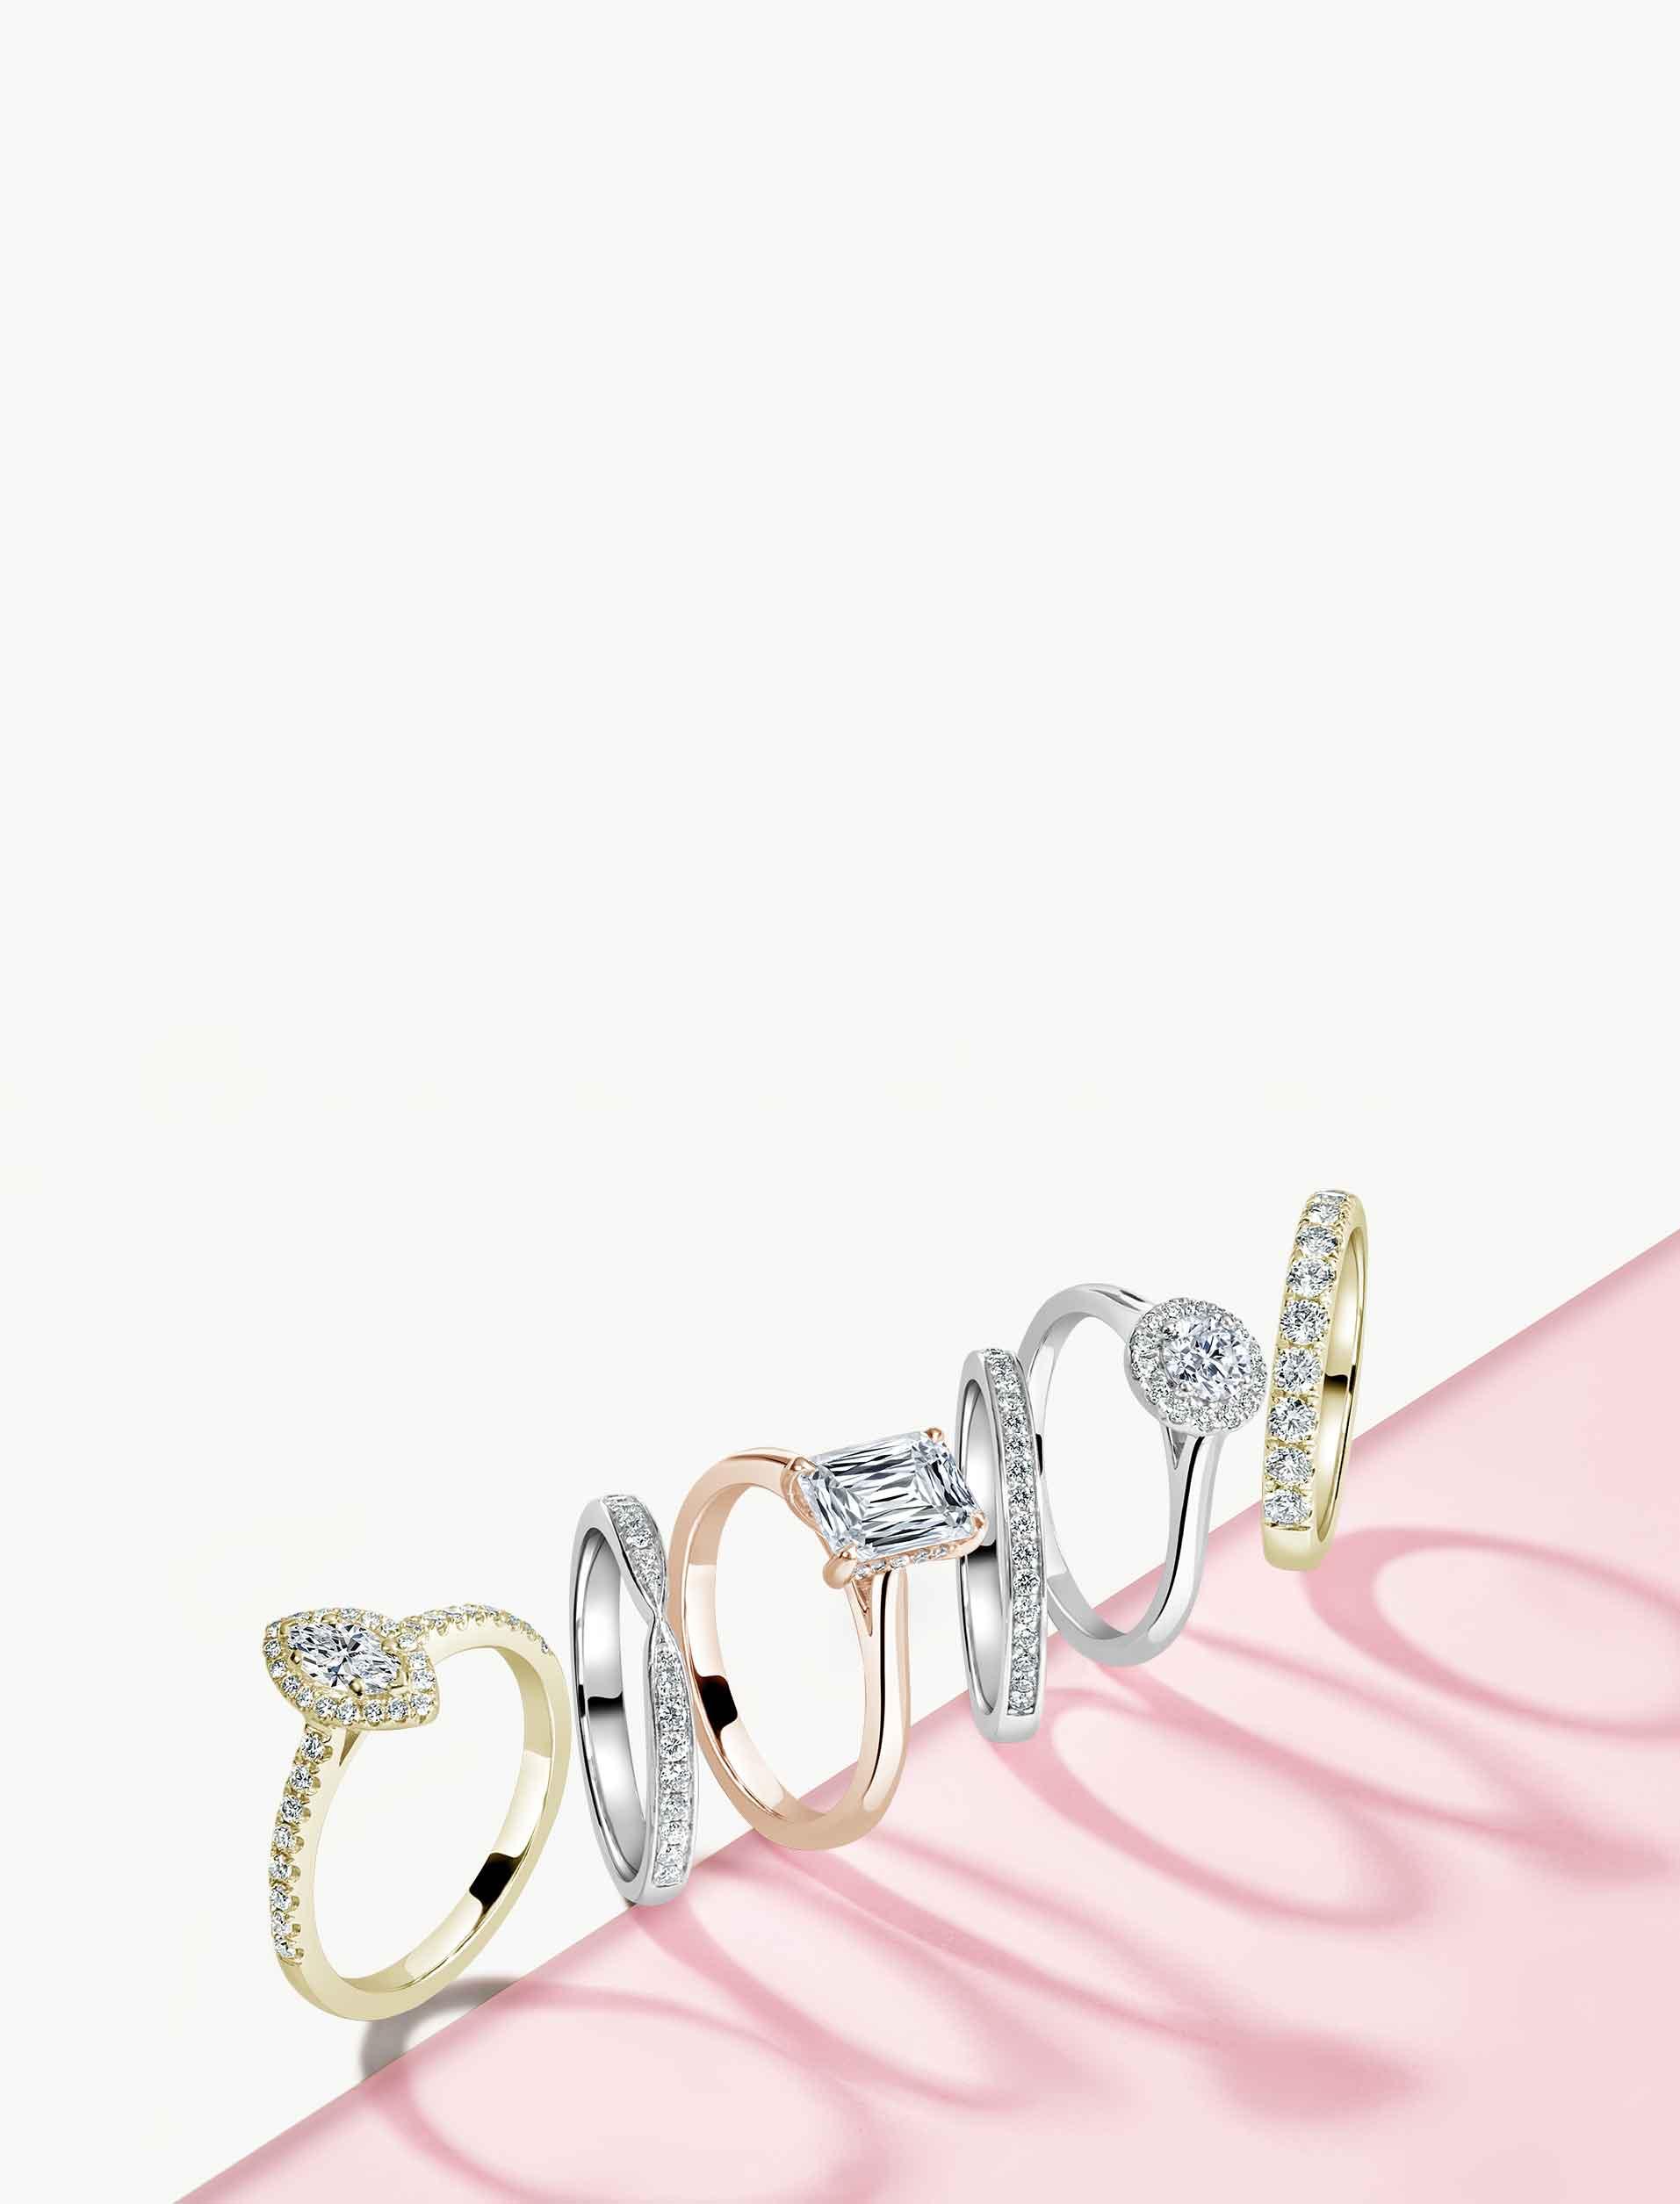 Platinum Solitaire Engagement Rings - Steven Stone